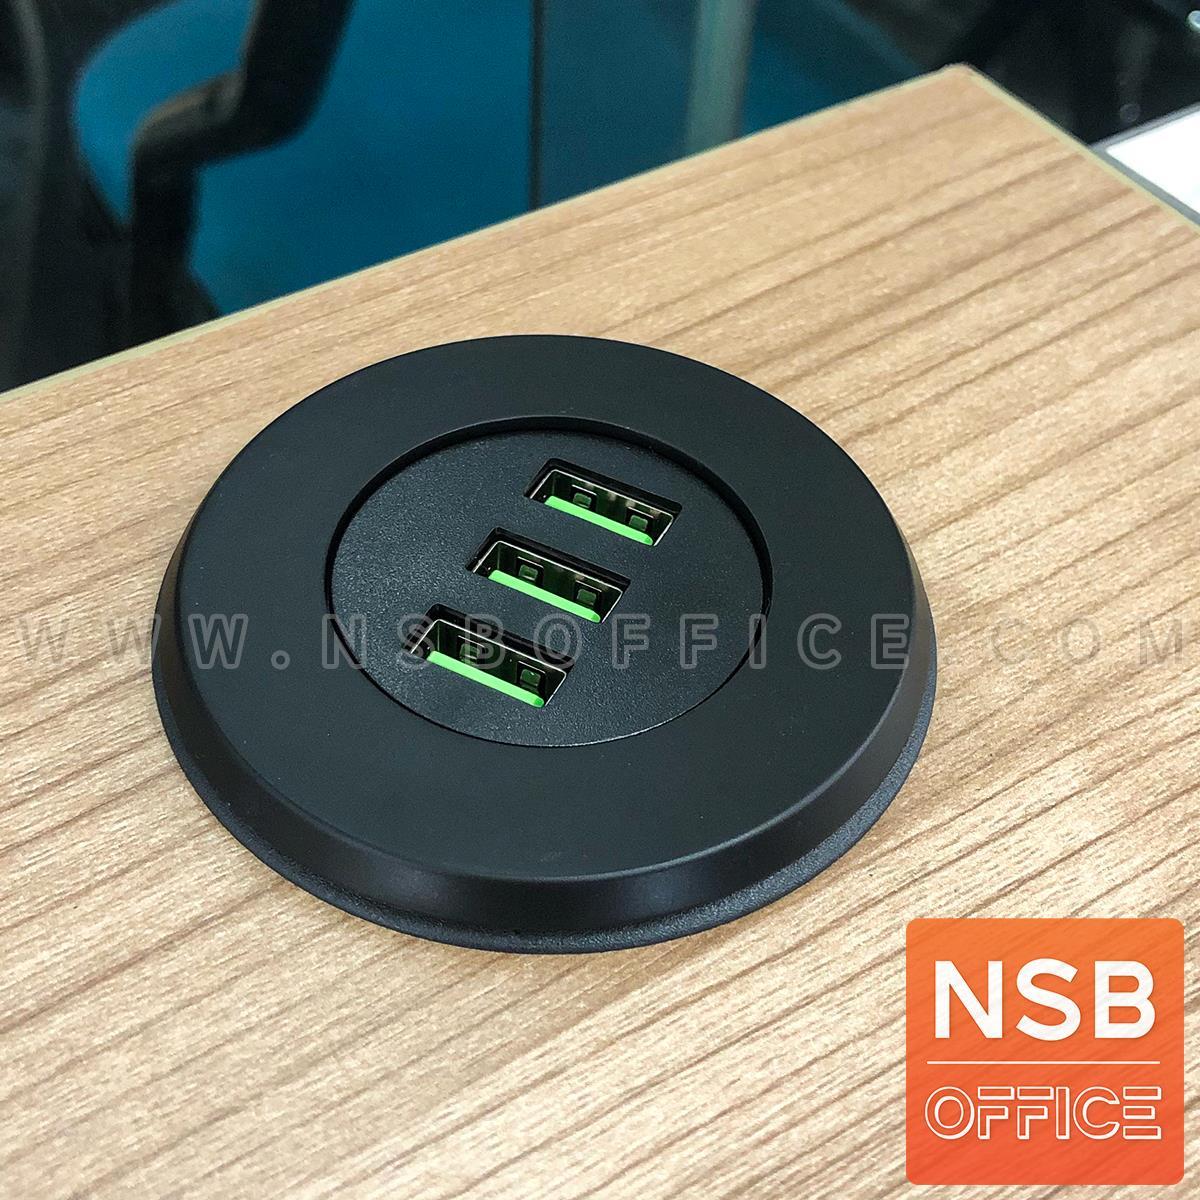 A03A038:พอร์ตฮับอะแดปเตอร์ USB 2.0 Hub รุ่น Rovski  ขนาด 43Di mm.